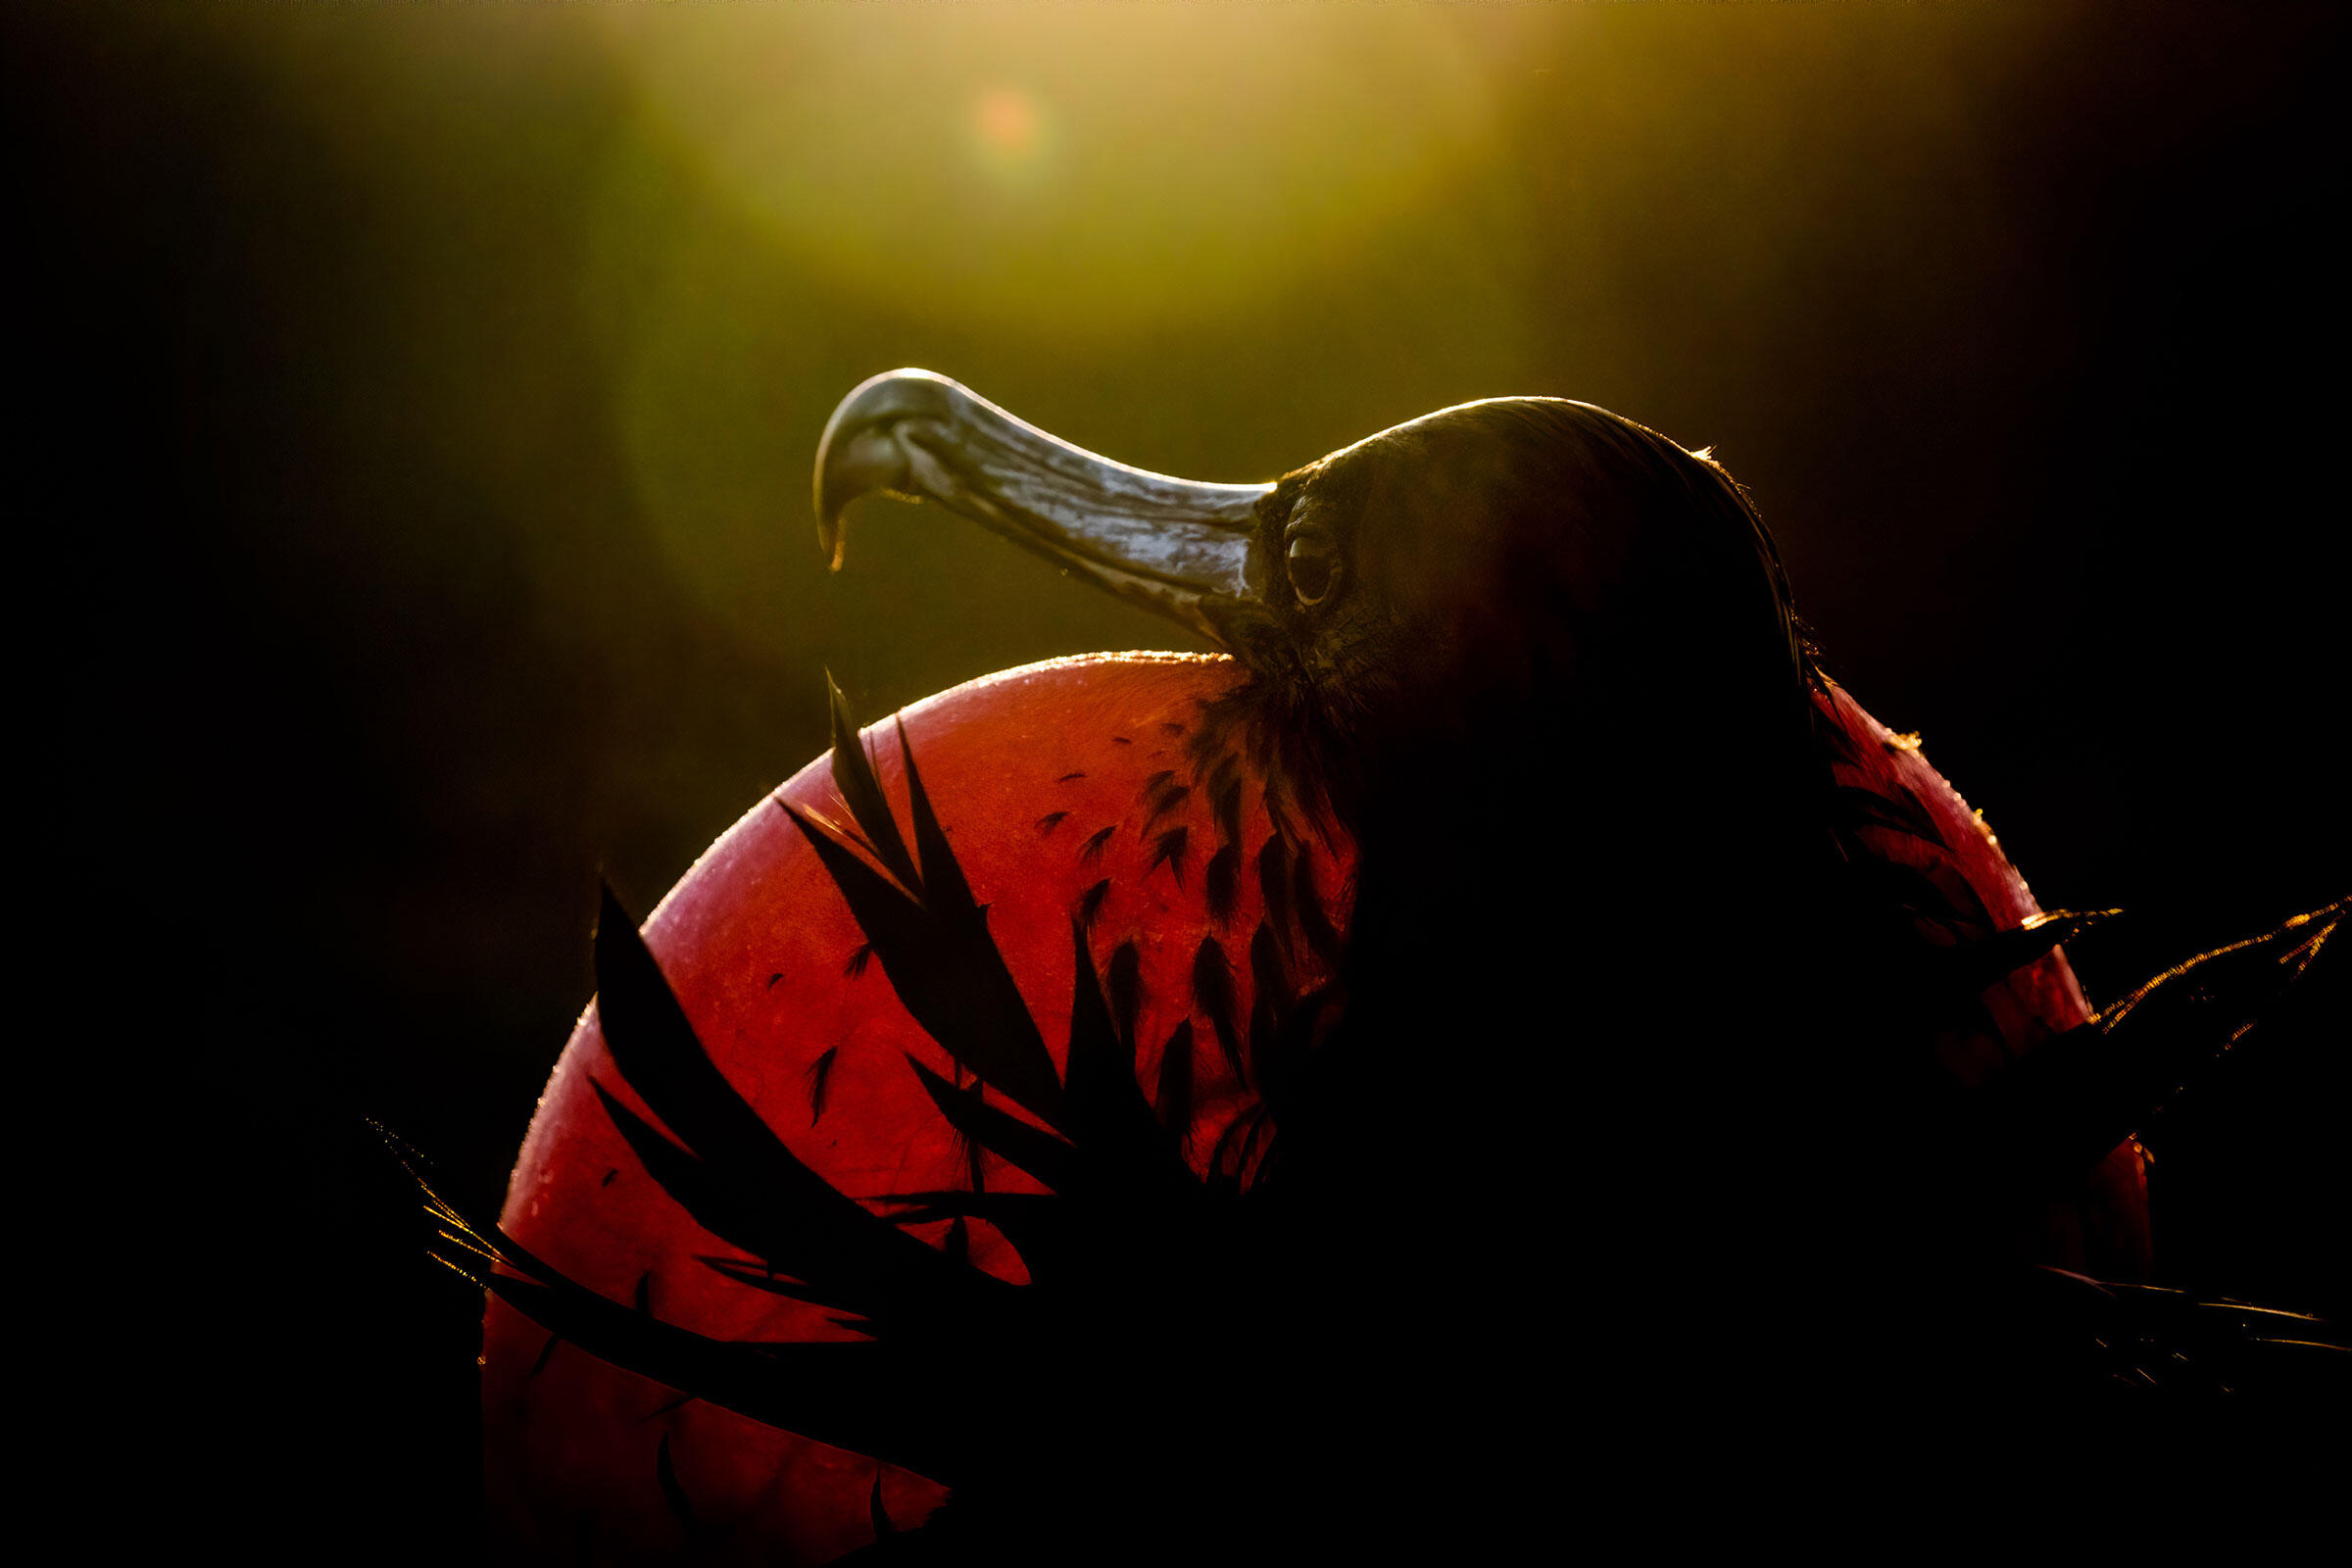 Magnificent Frigatebird. Sue Dougherty/Audubon Photography Awards